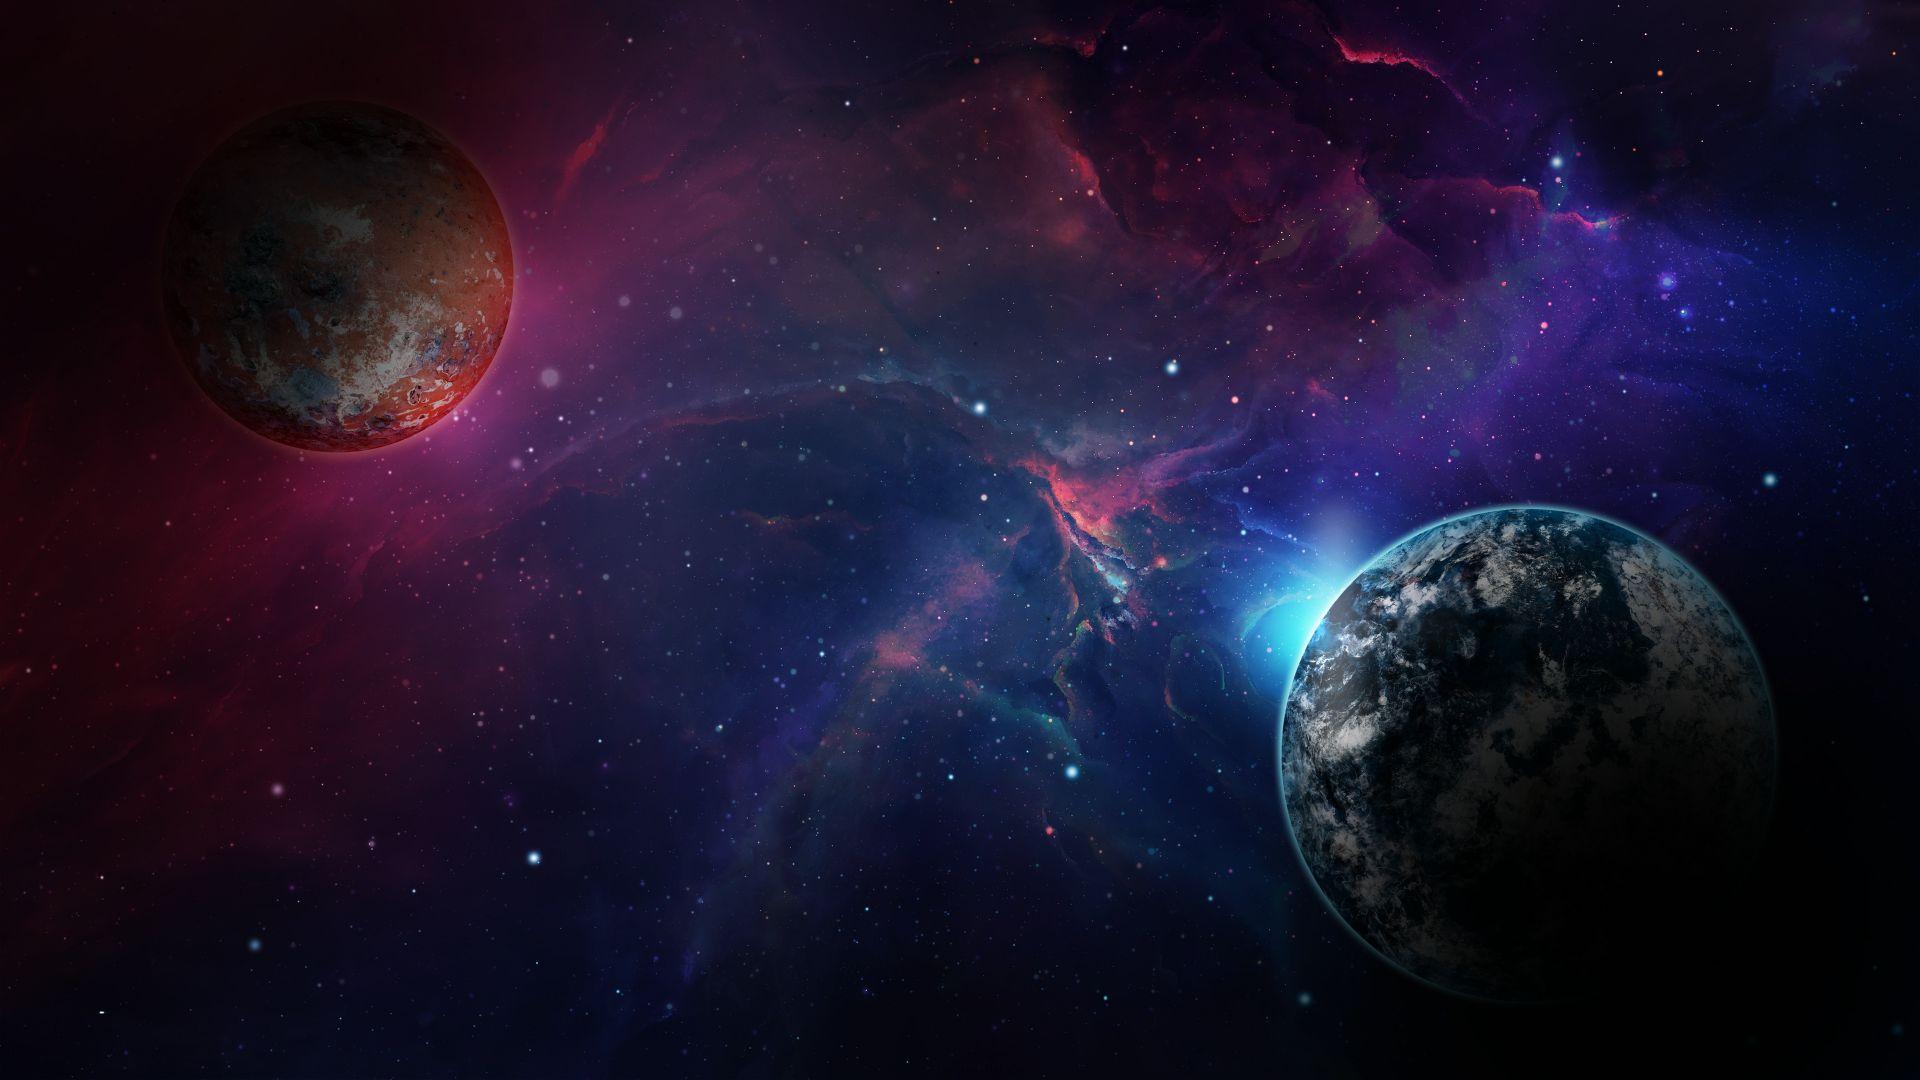 Wallpaper space galaxy planet 4k space 17043 - Space 4k phone wallpaper ...